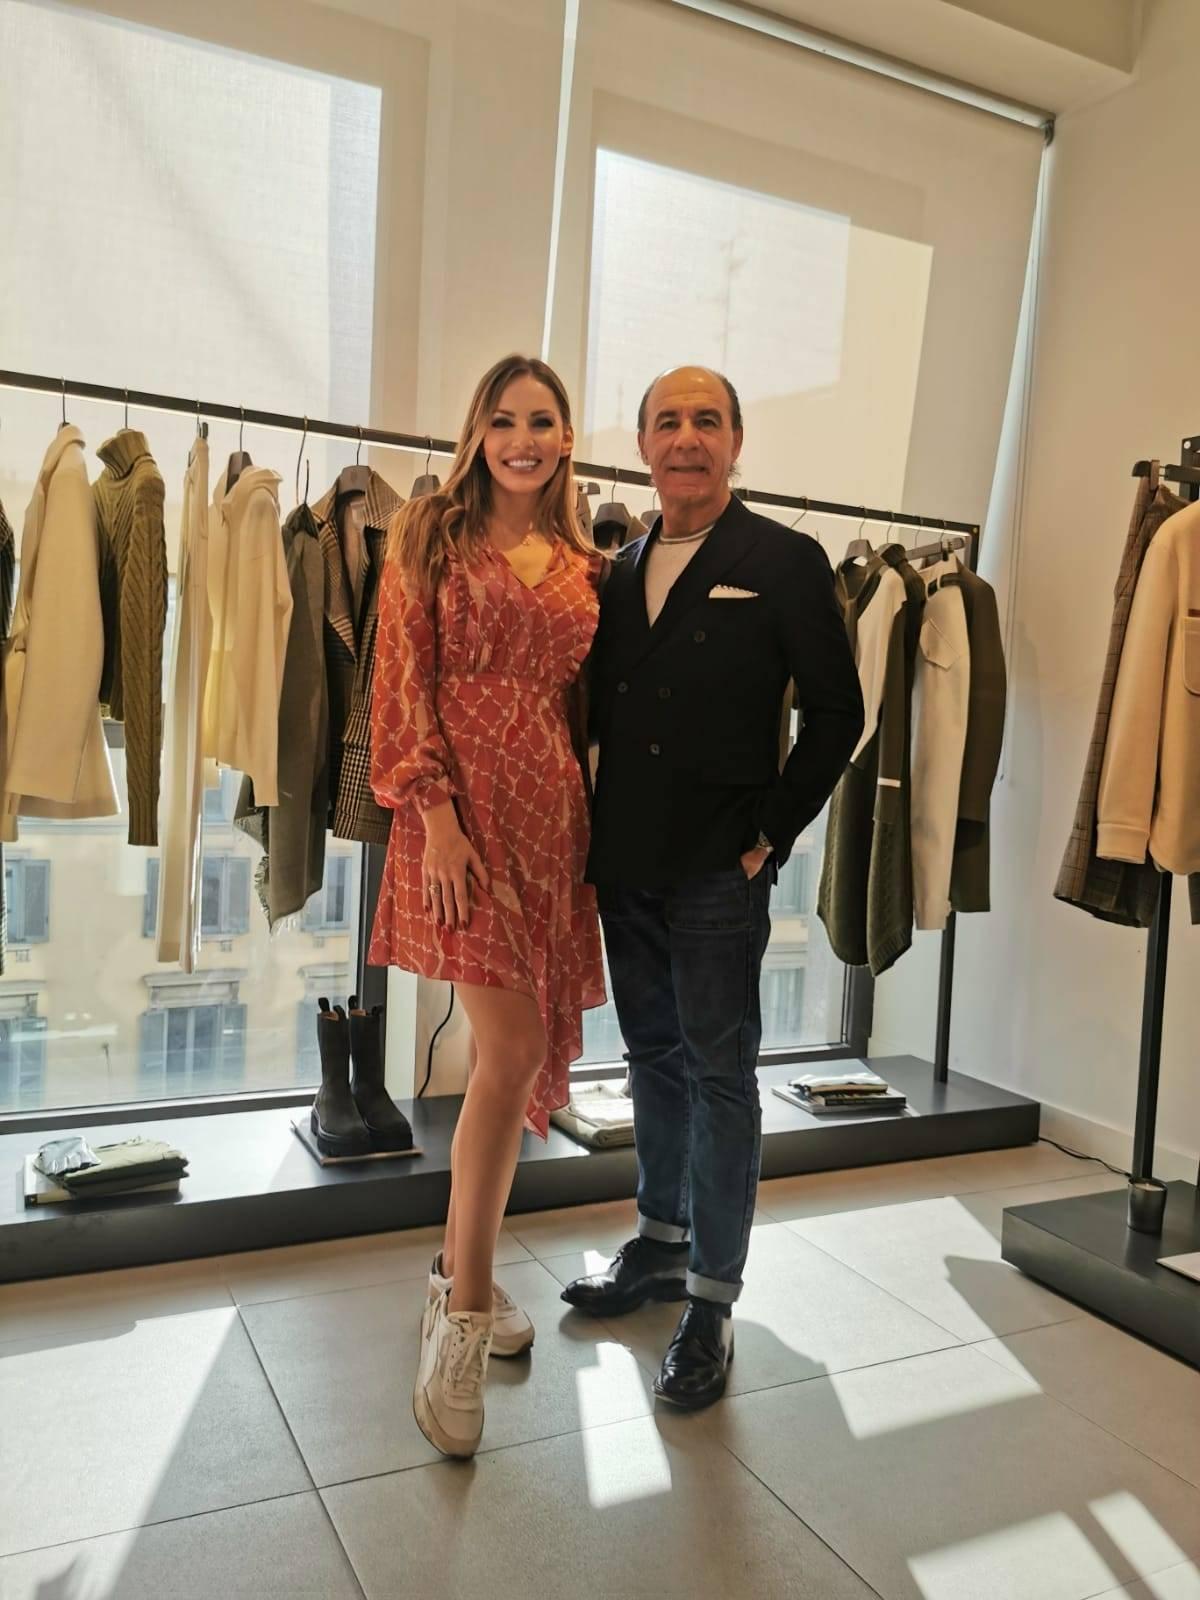 Izabela Bella_zofia with Paolo Zuntini from Eleventi. Milan Fashion Week